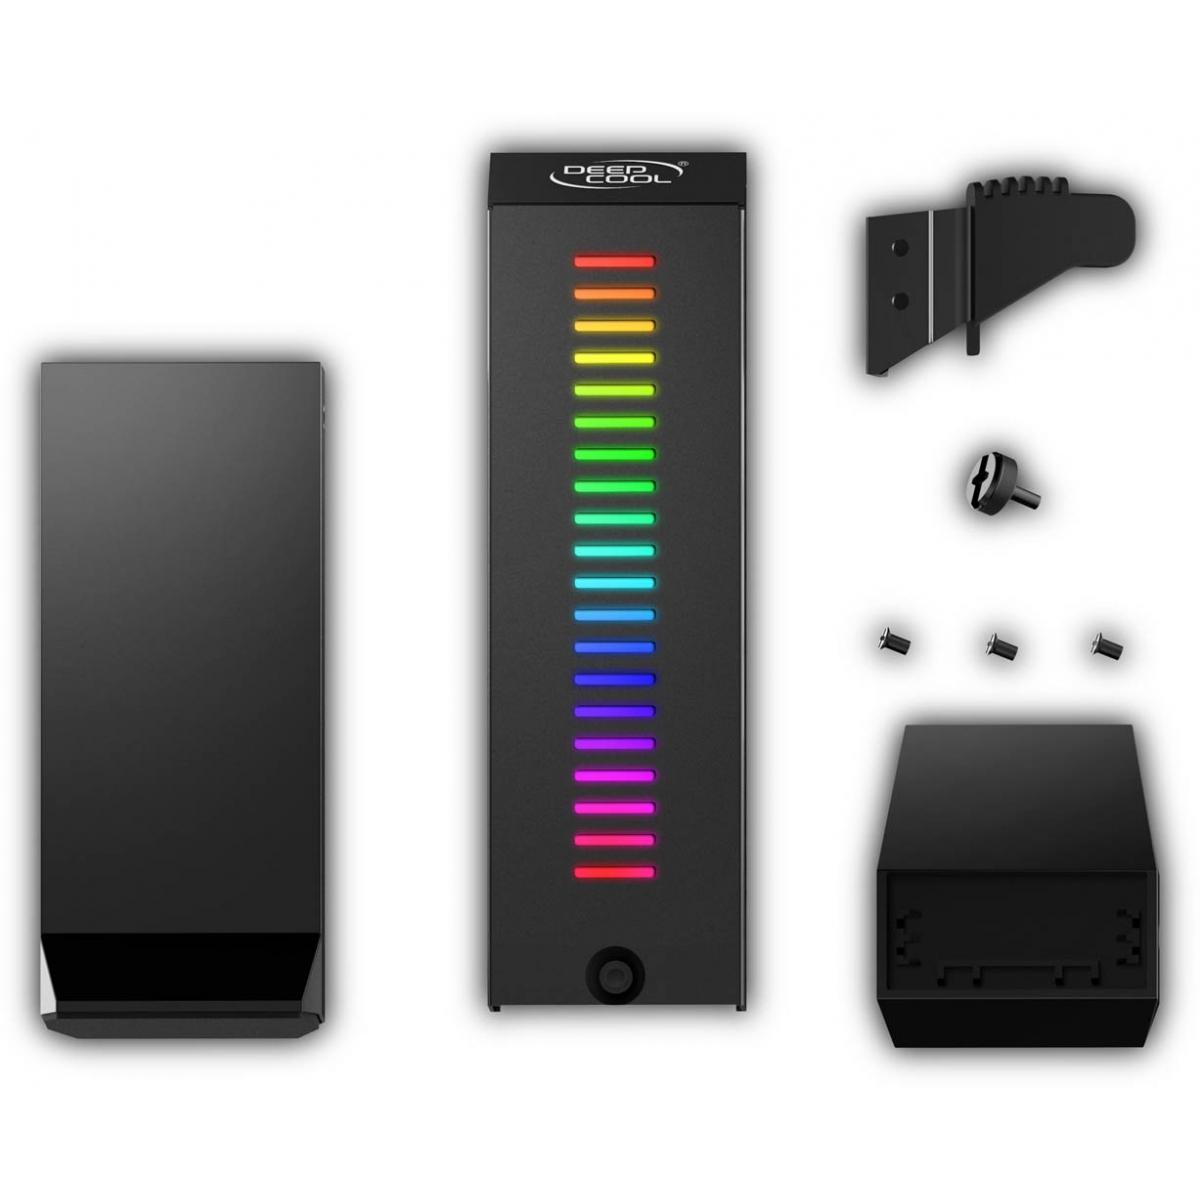 Suporte de Placa de Vídeo Deepcool GH-01 A-RGB, Black, DP-GH01-ARGB